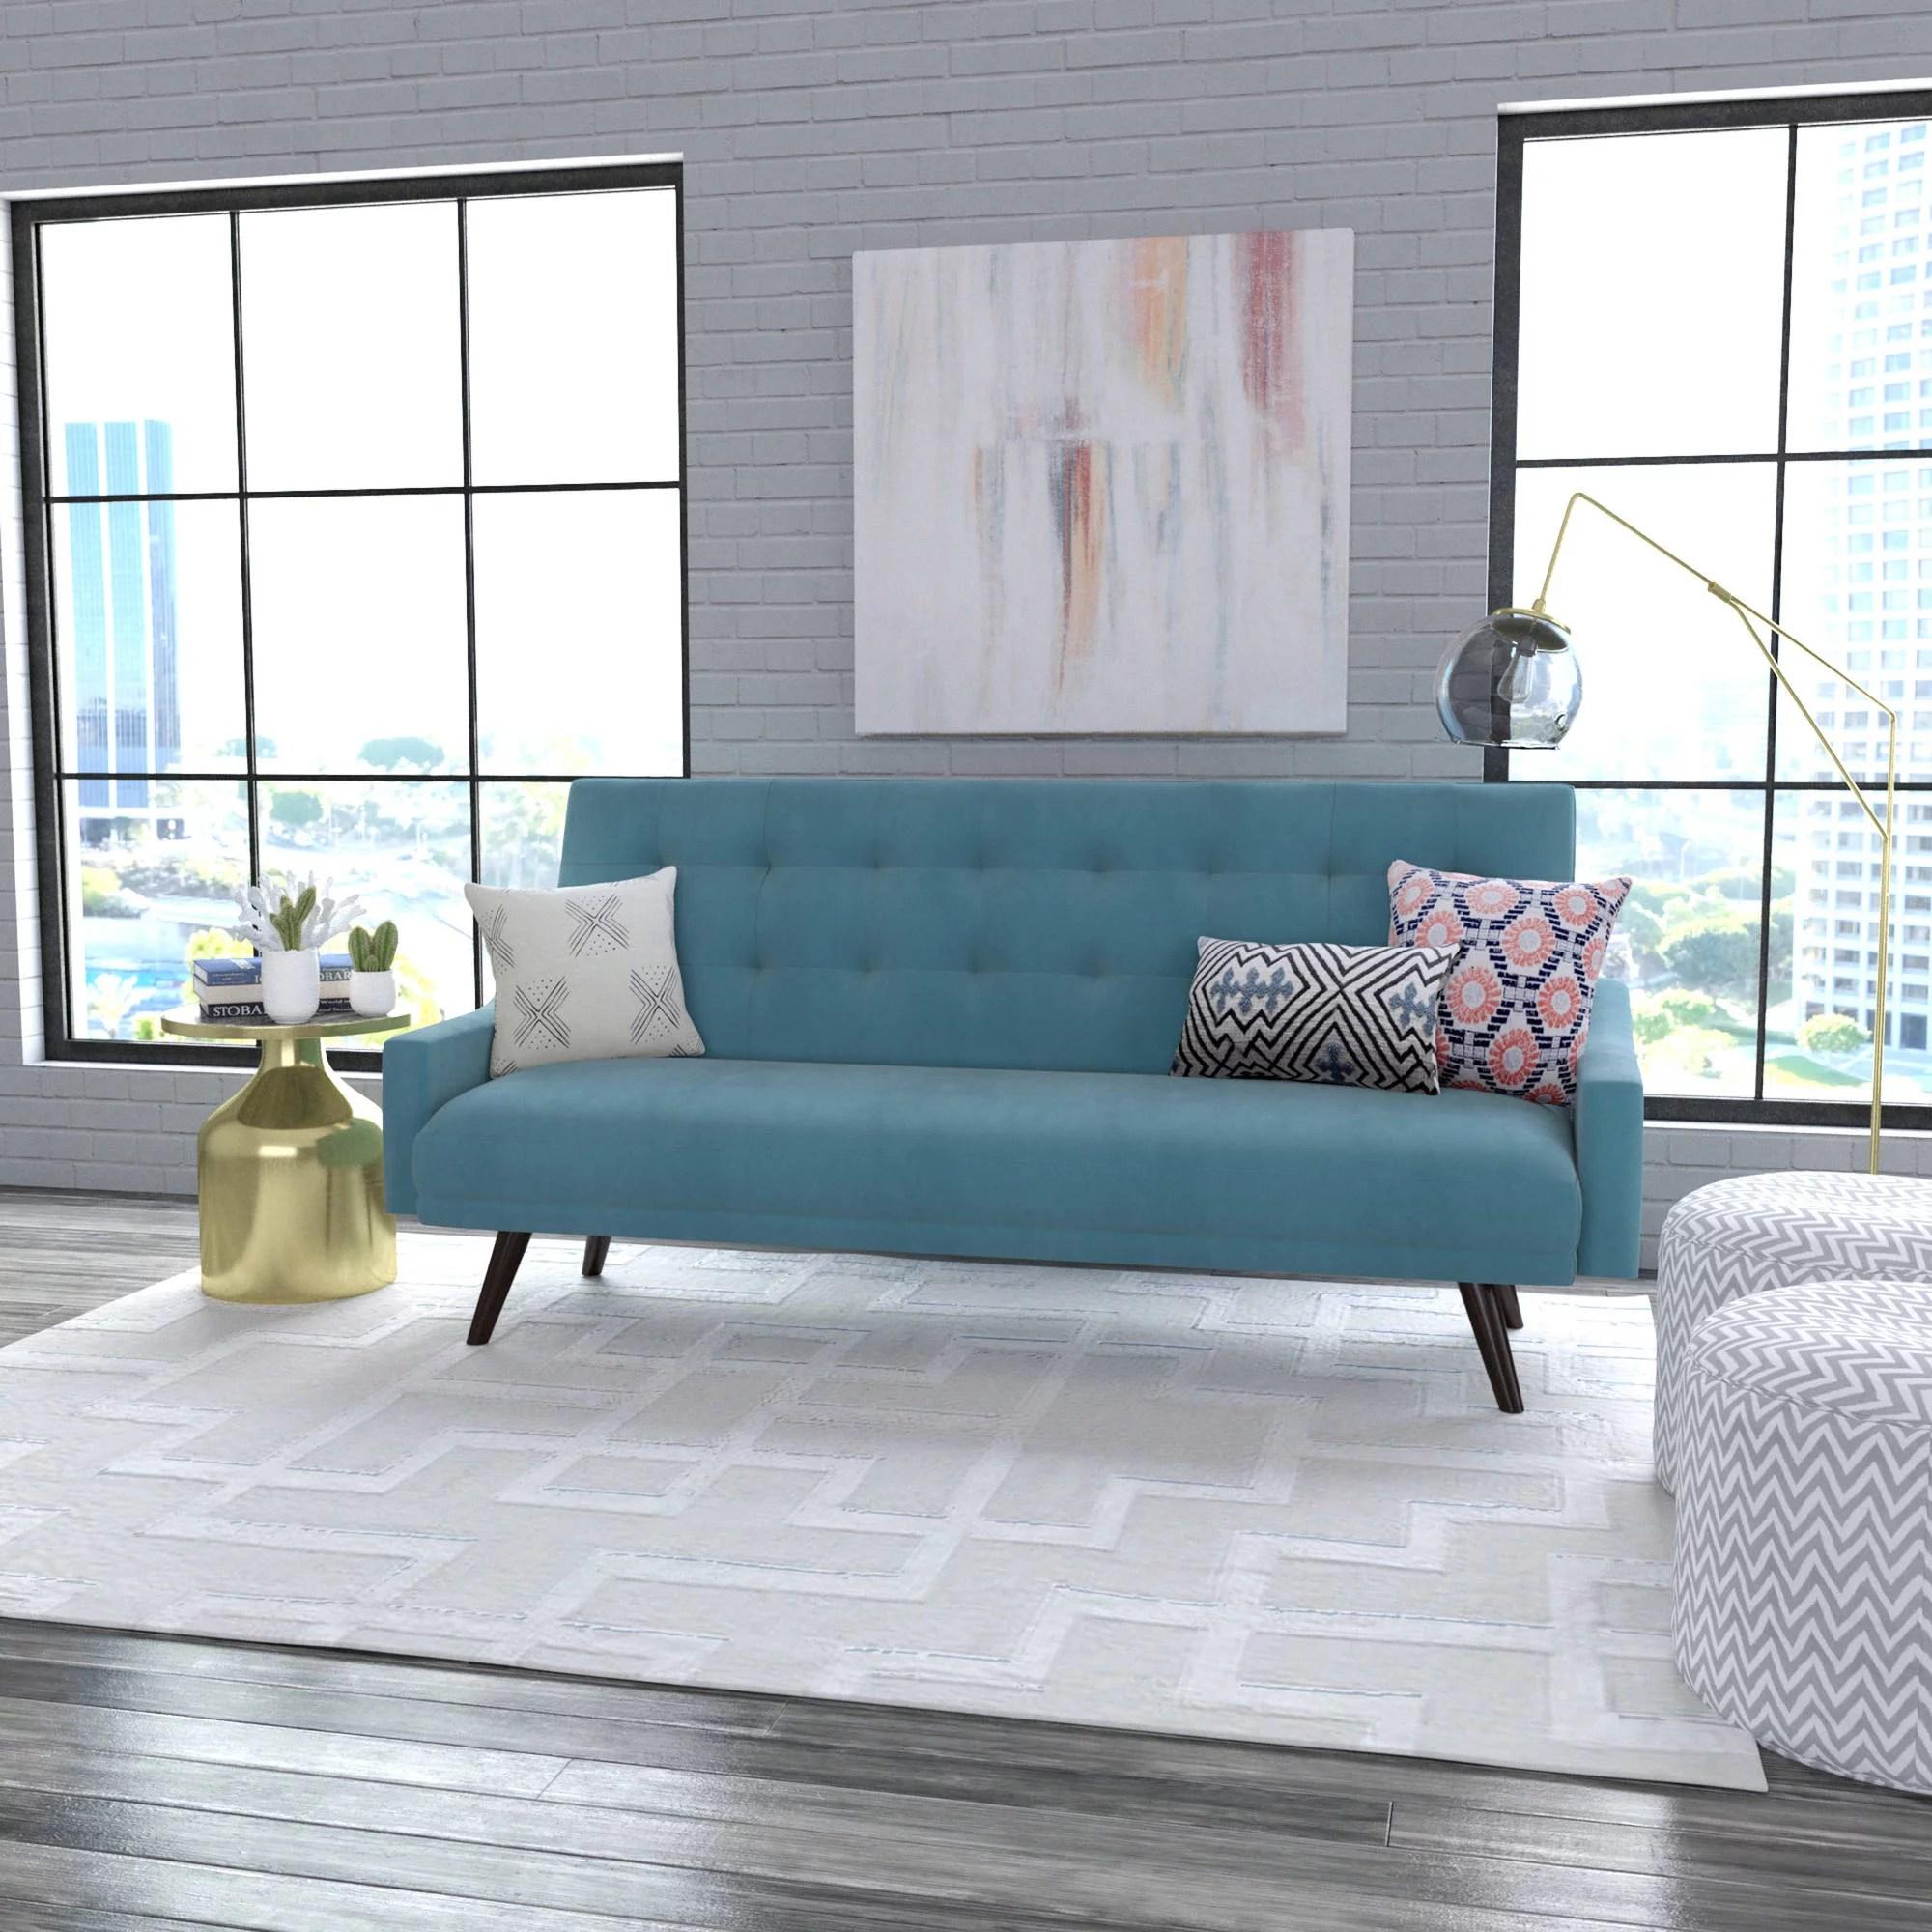 Oakland Futon Sofa Bed Multiple Colors  Walmartcom